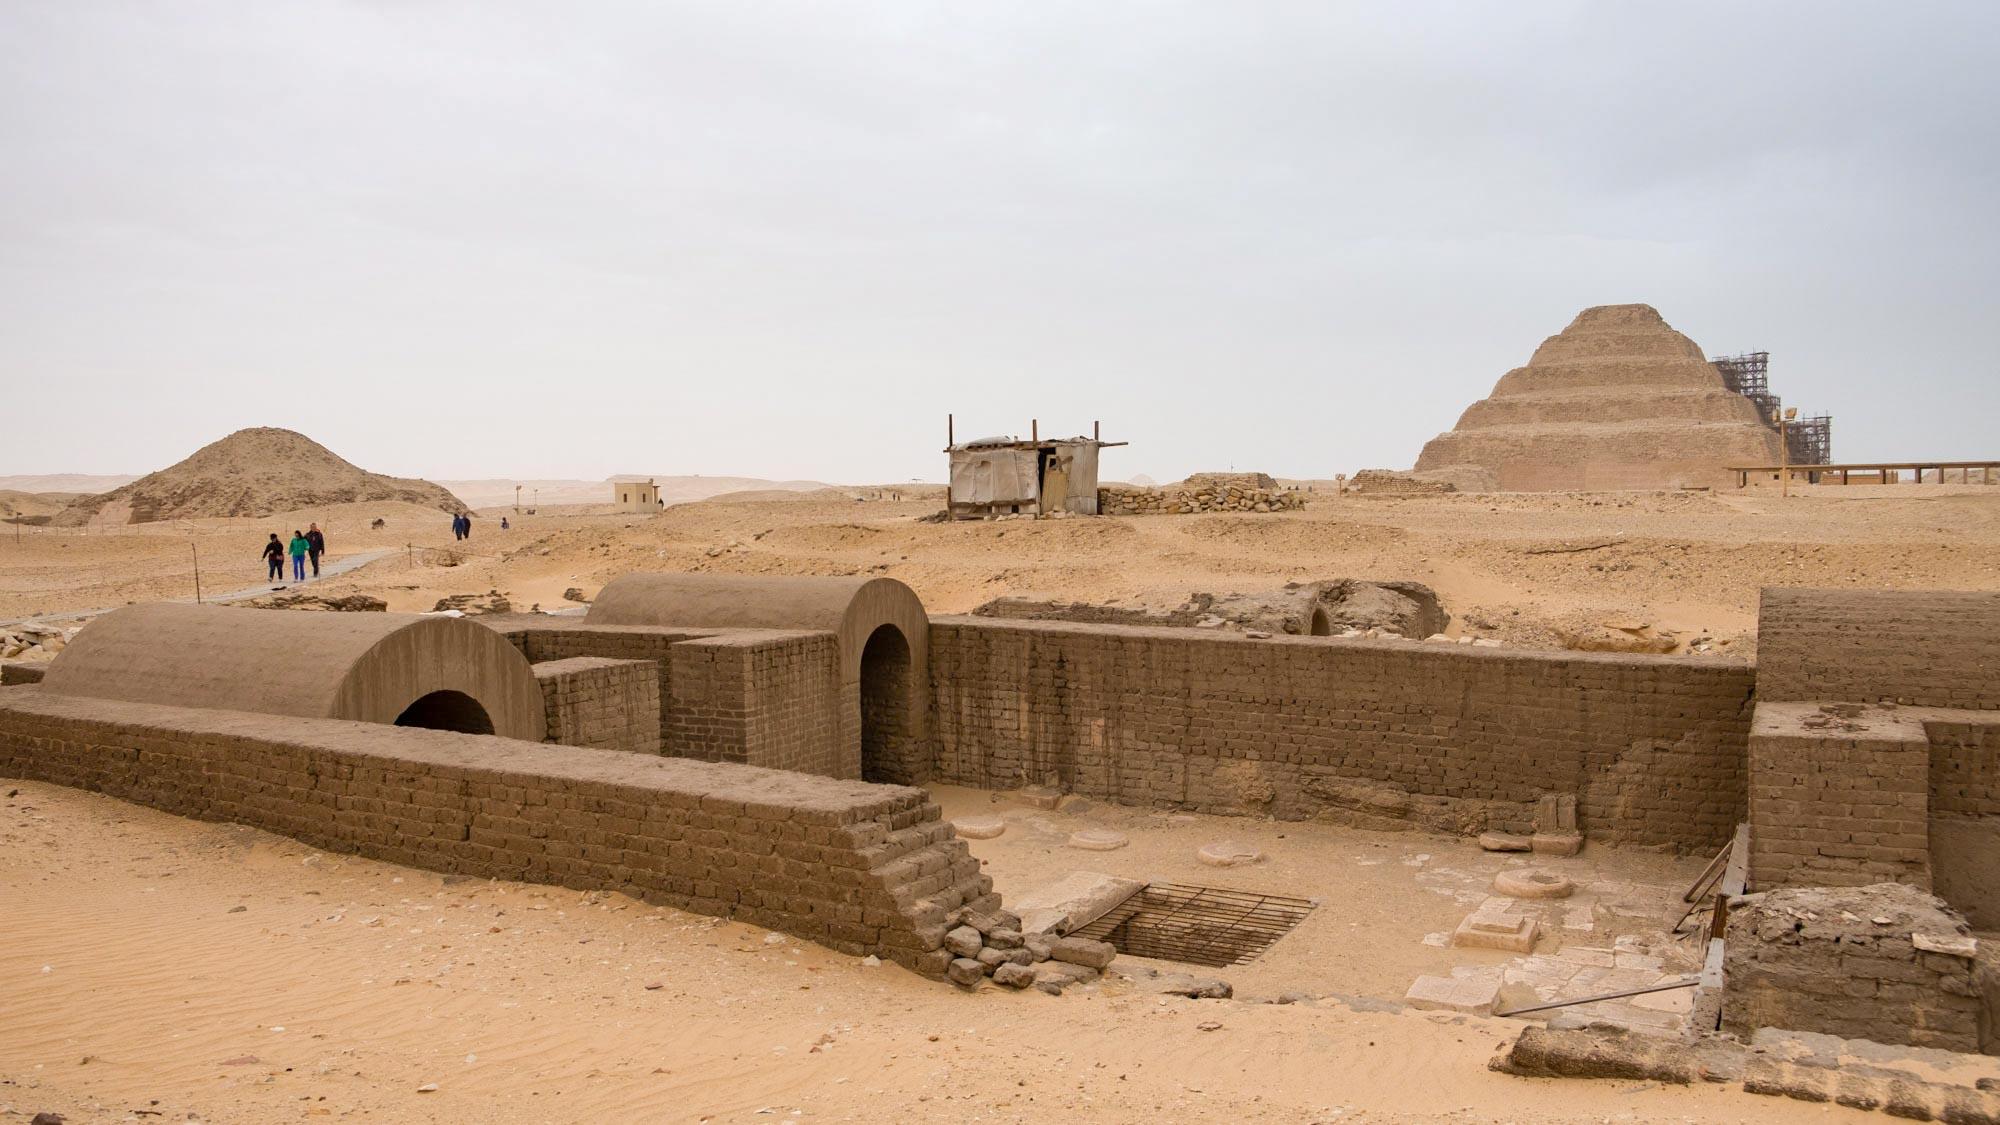 Visiting Egypt Pyramids